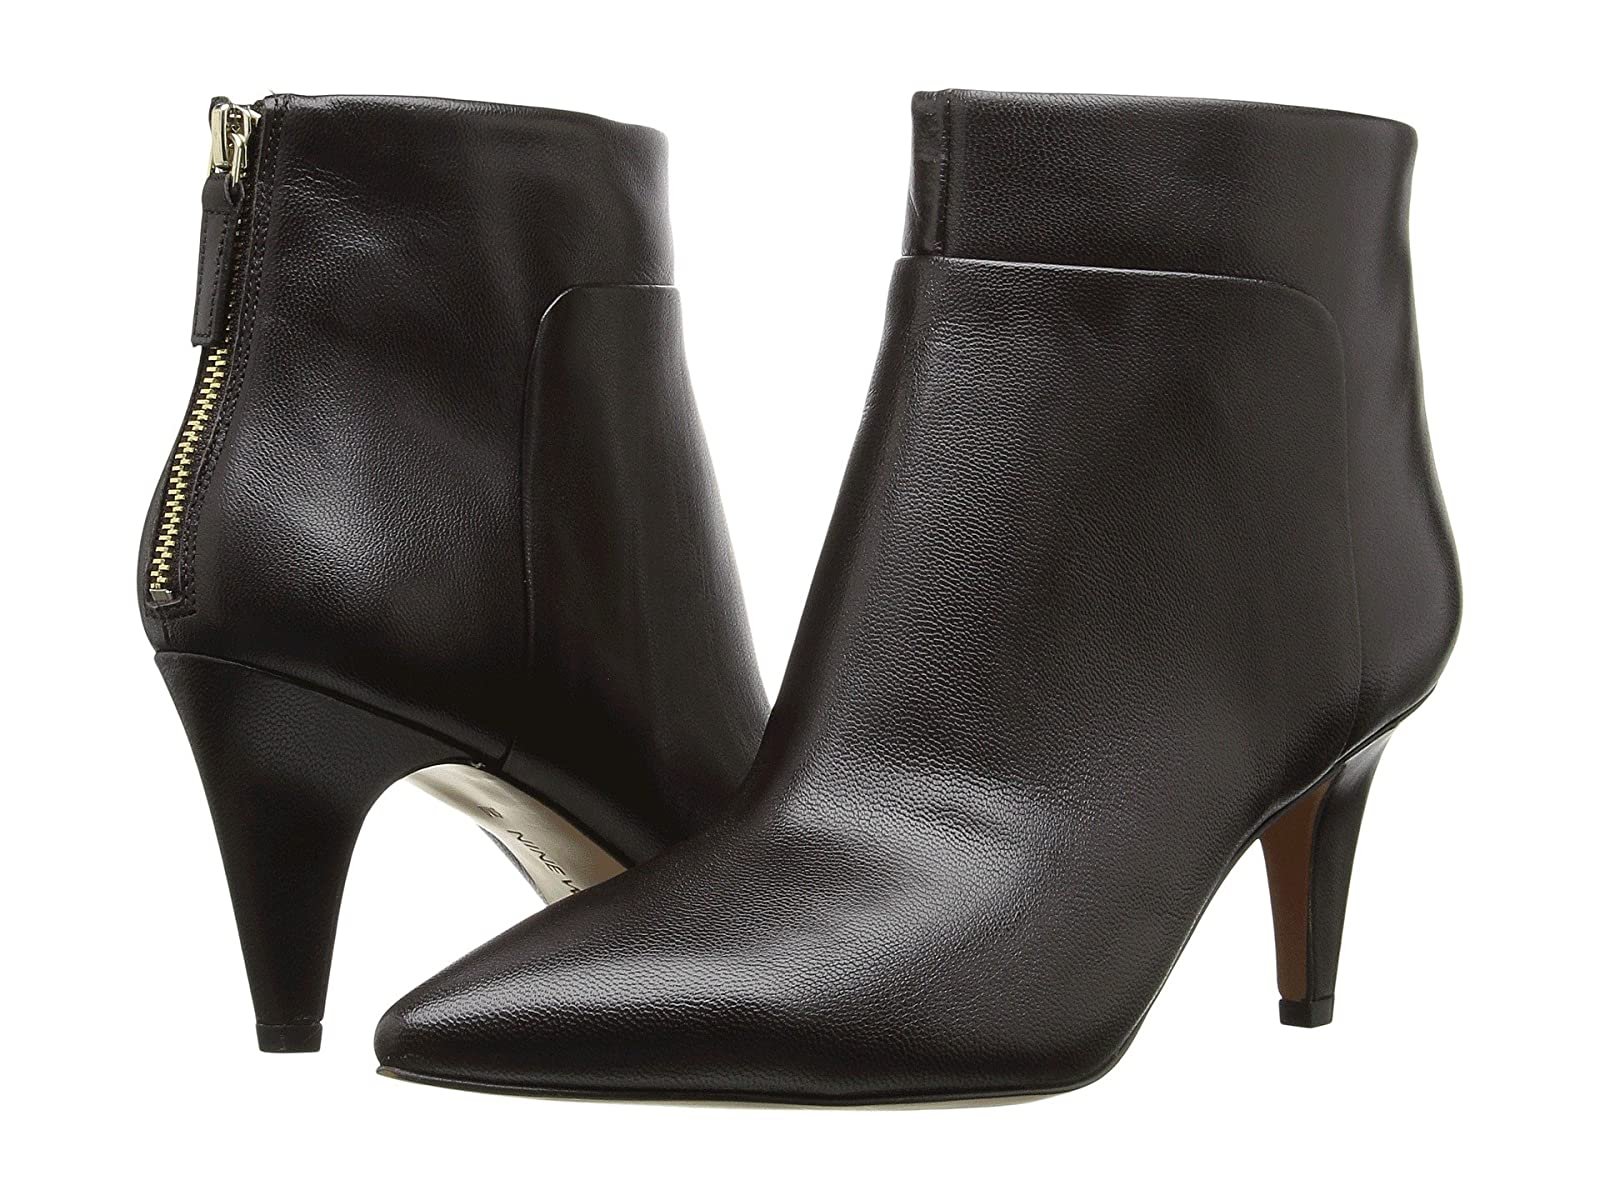 Nine West JinxieCheap and distinctive eye-catching shoes